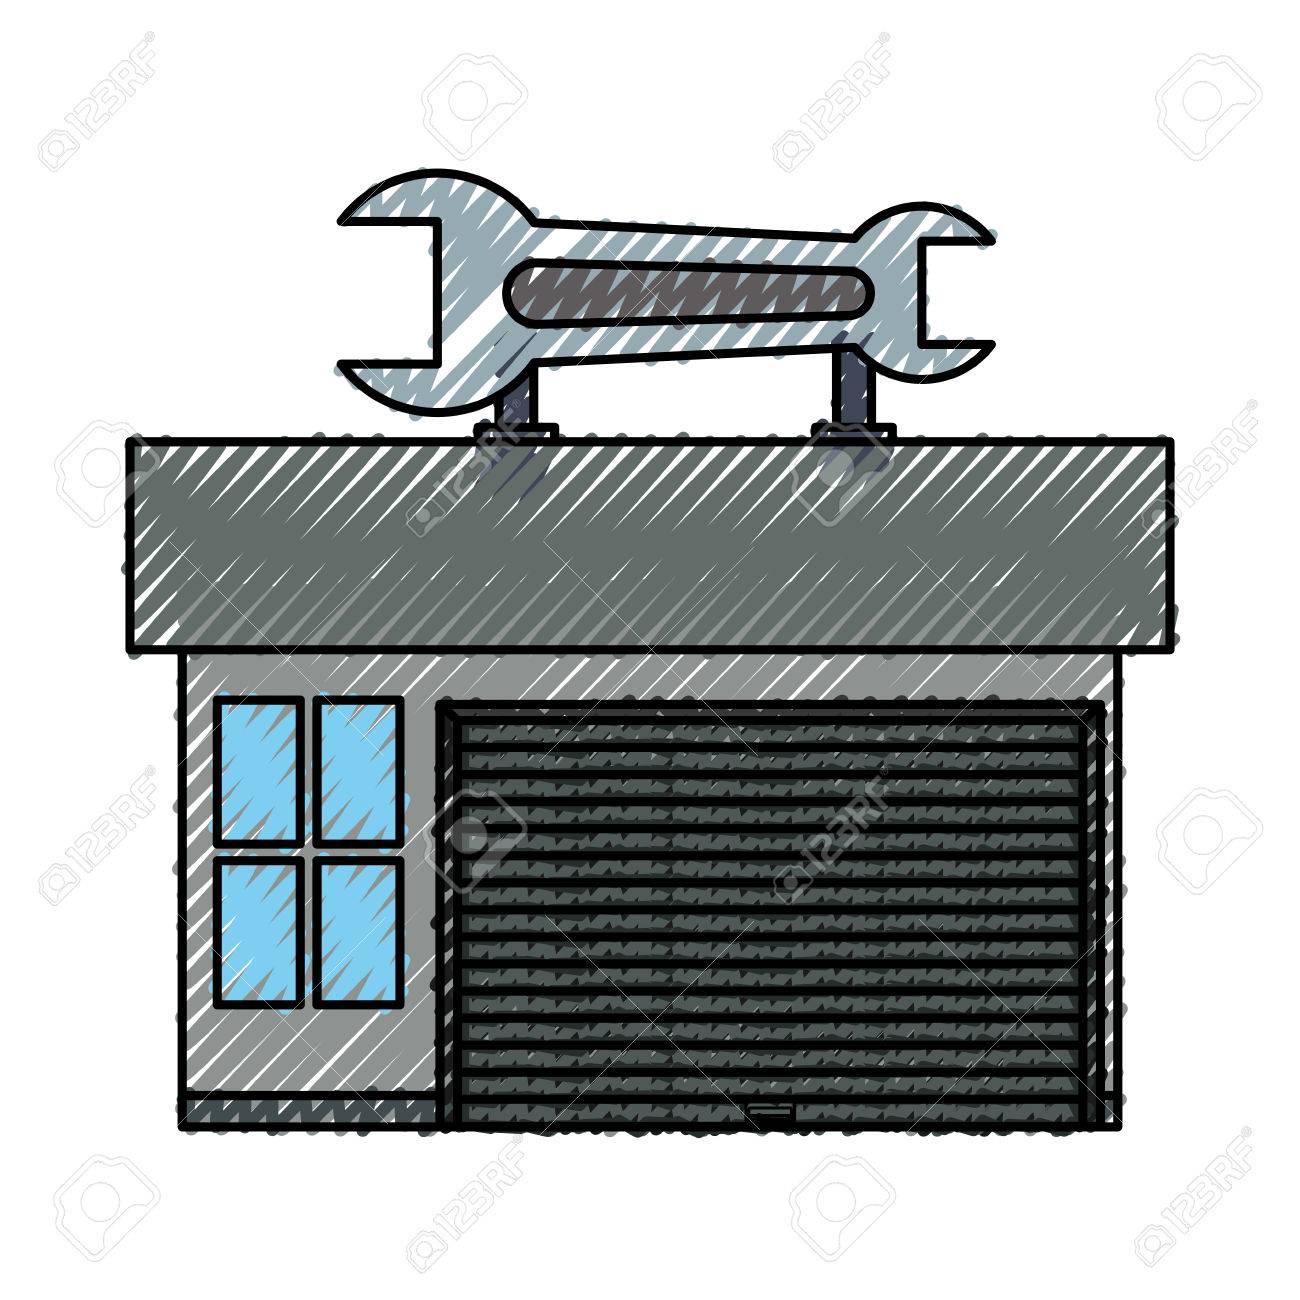 Garage Door Mechanic Icon Vector Illustration Graphic Design Royalty